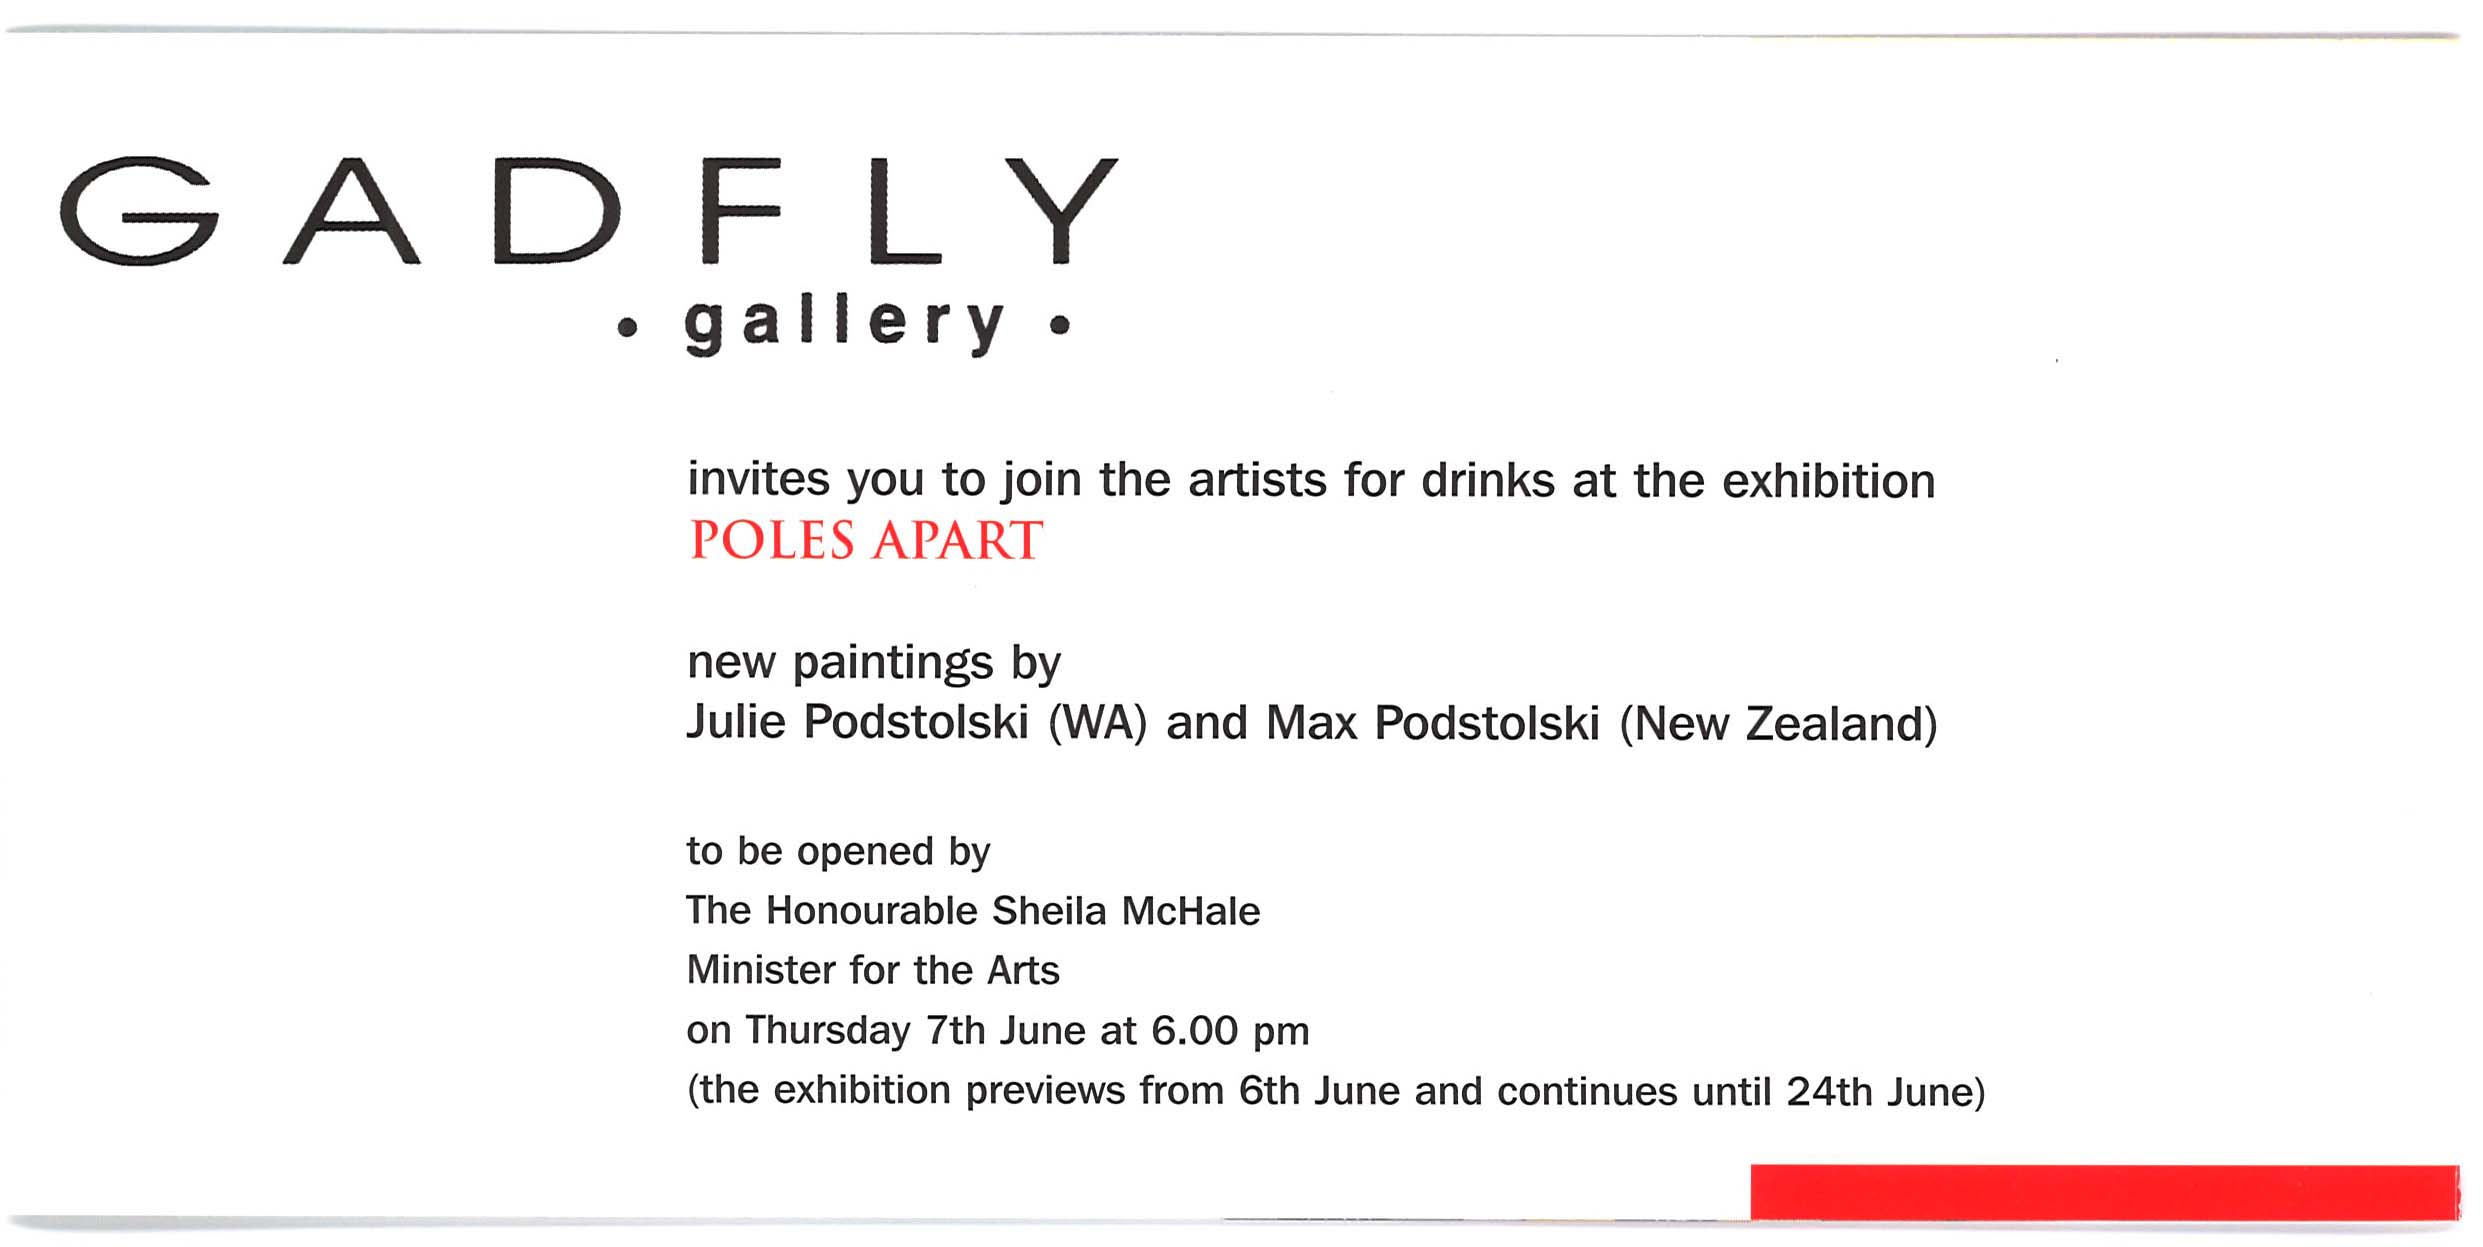 Archive Of Exhibition Invitations Julie Podstolski